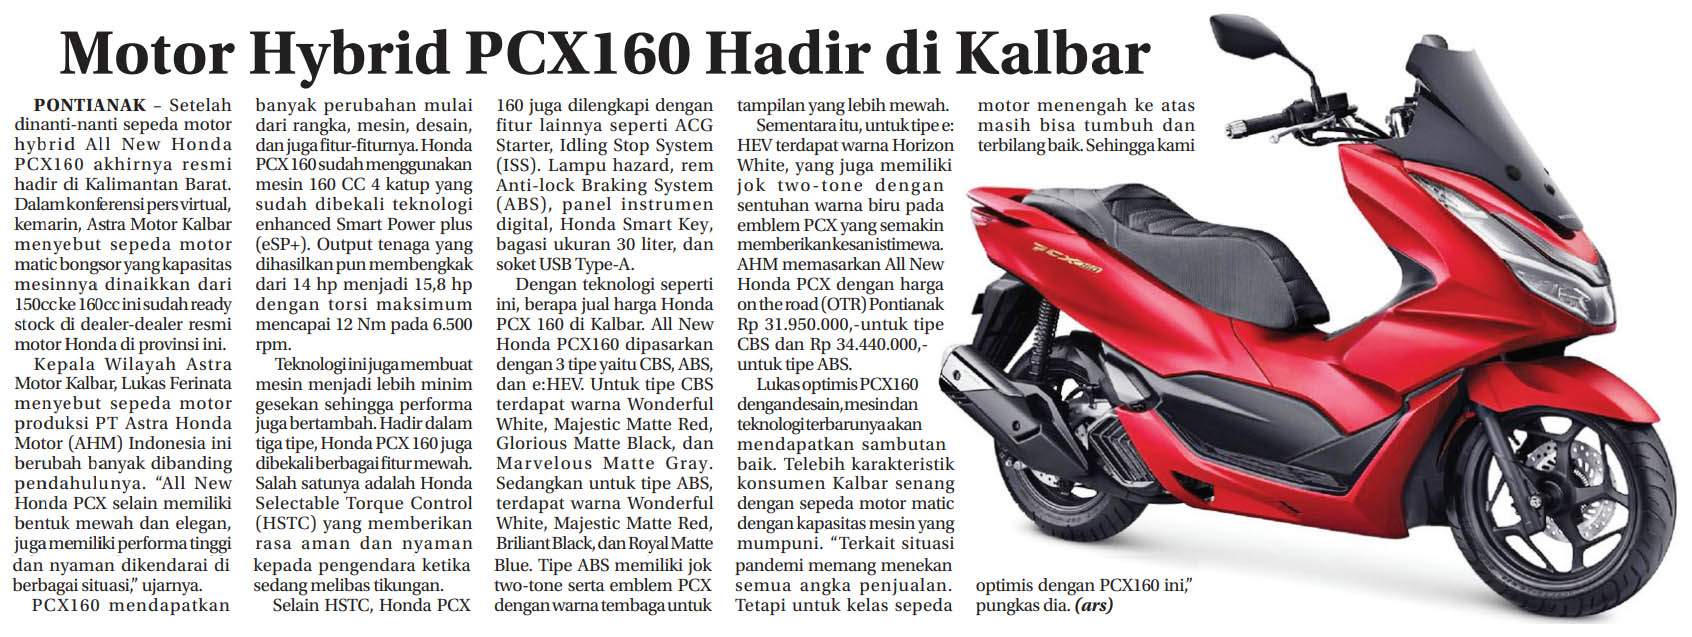 01 mar 2021 Motor Hybrid PCX160 Hadir di Kalbar